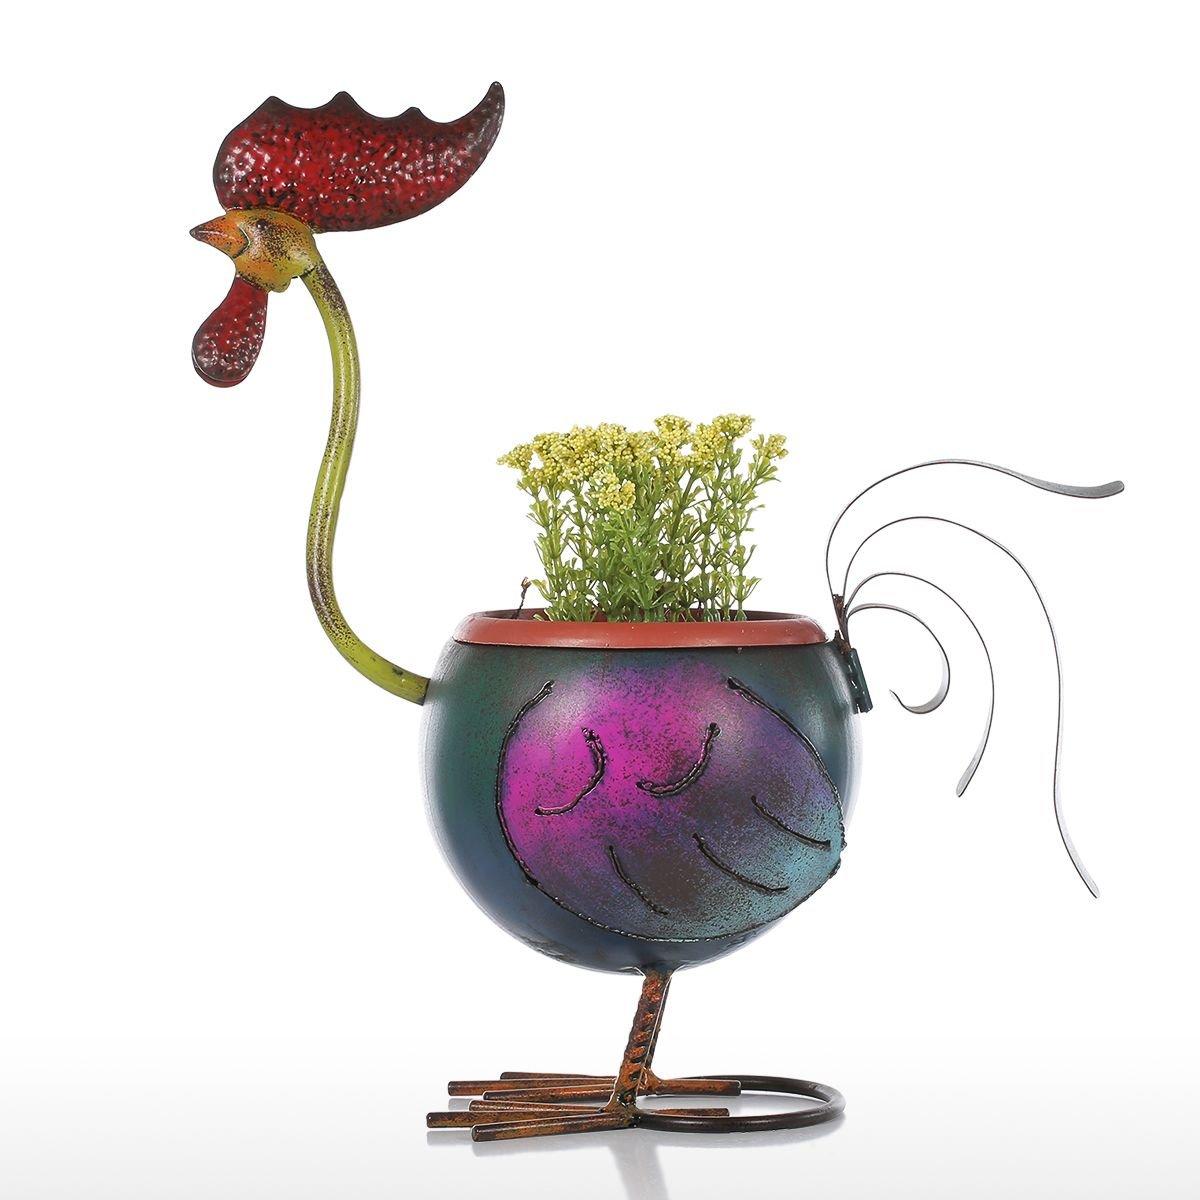 Tooarts Rooster Garden Pots Metal Animal Planter Home Decoration Irregular Flower Pots Multicolor